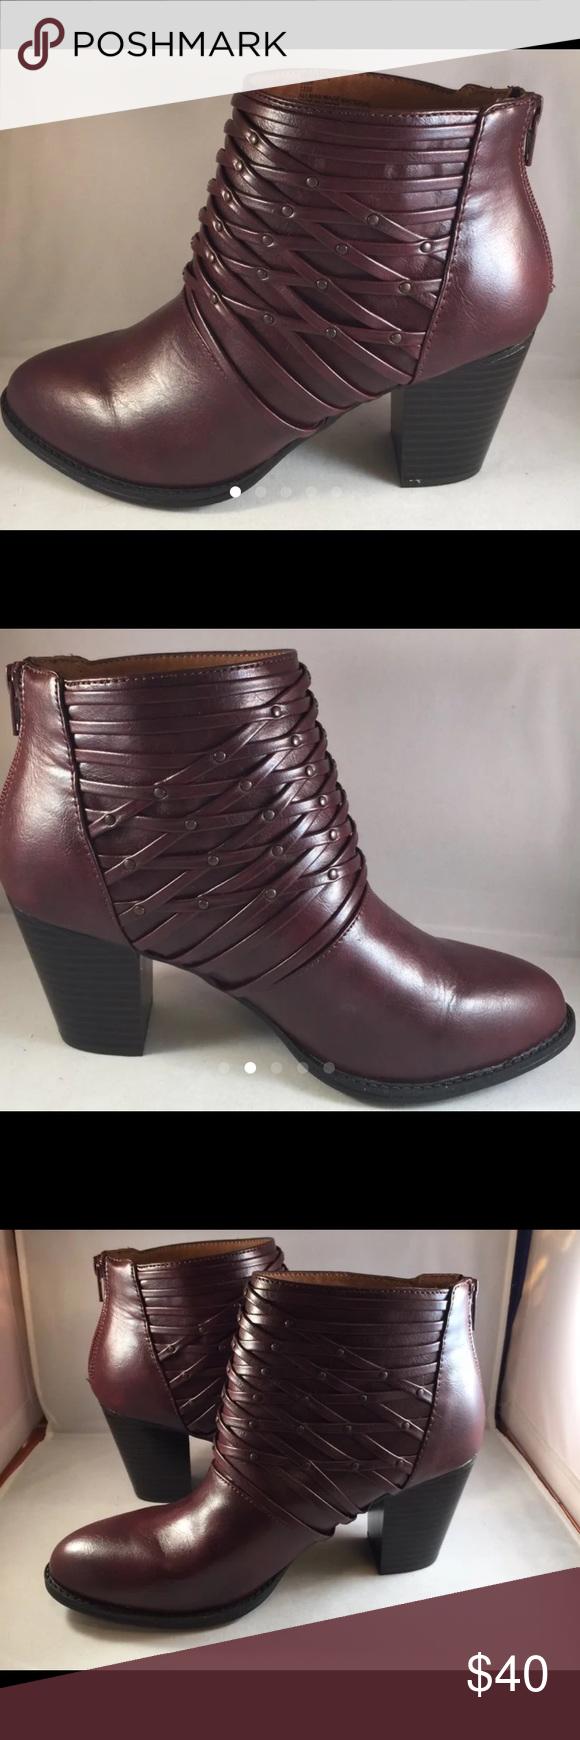 Cloudwalkers Fashion Ankle Boots